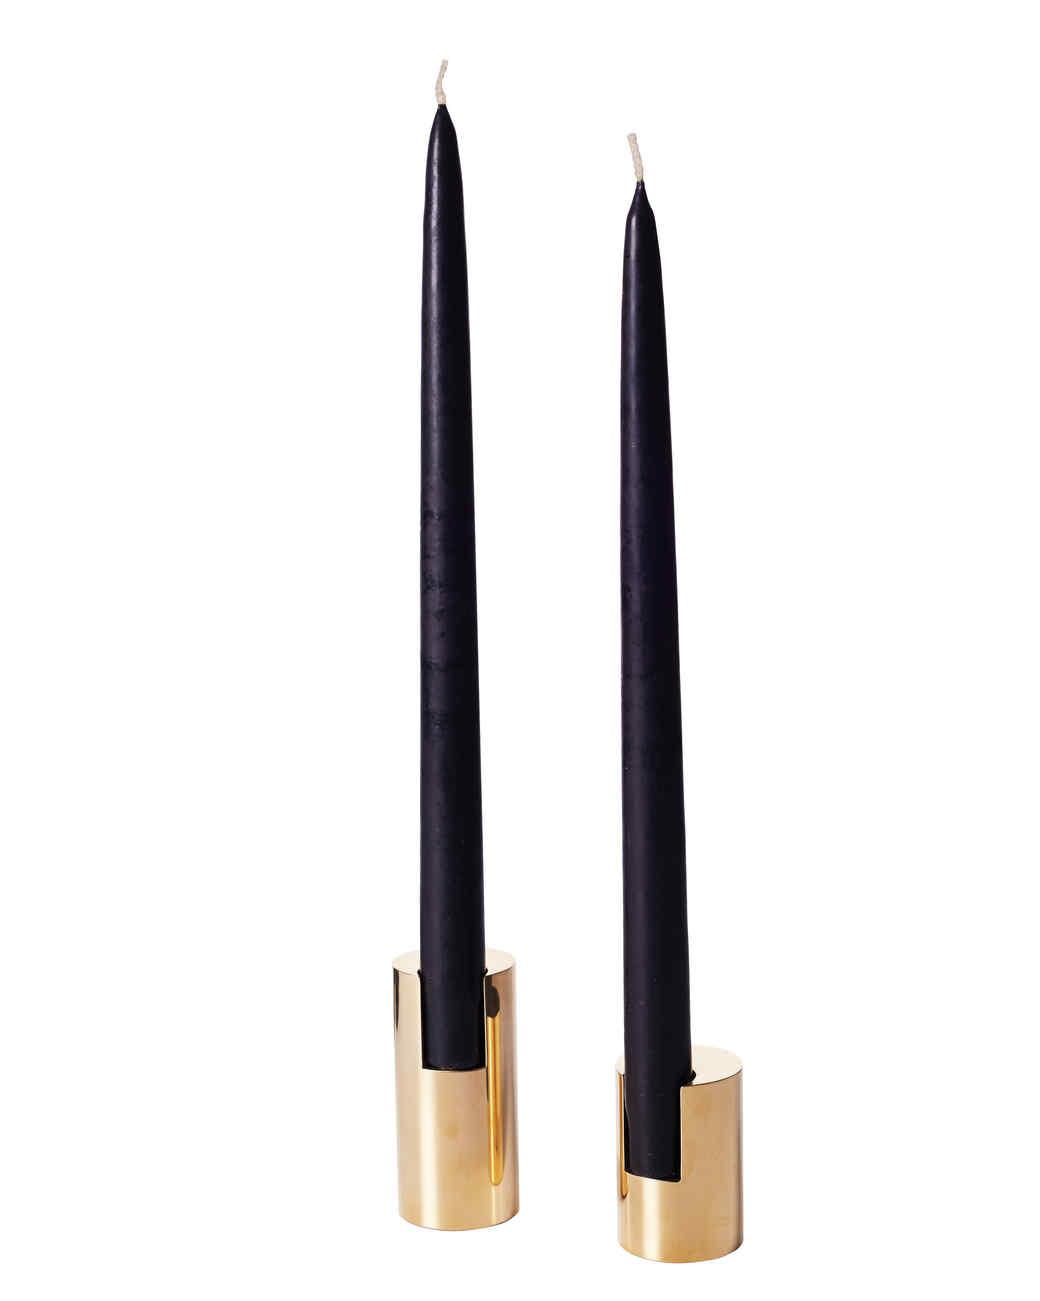 kim-thome-metallic-candles-001-d111476.jpg